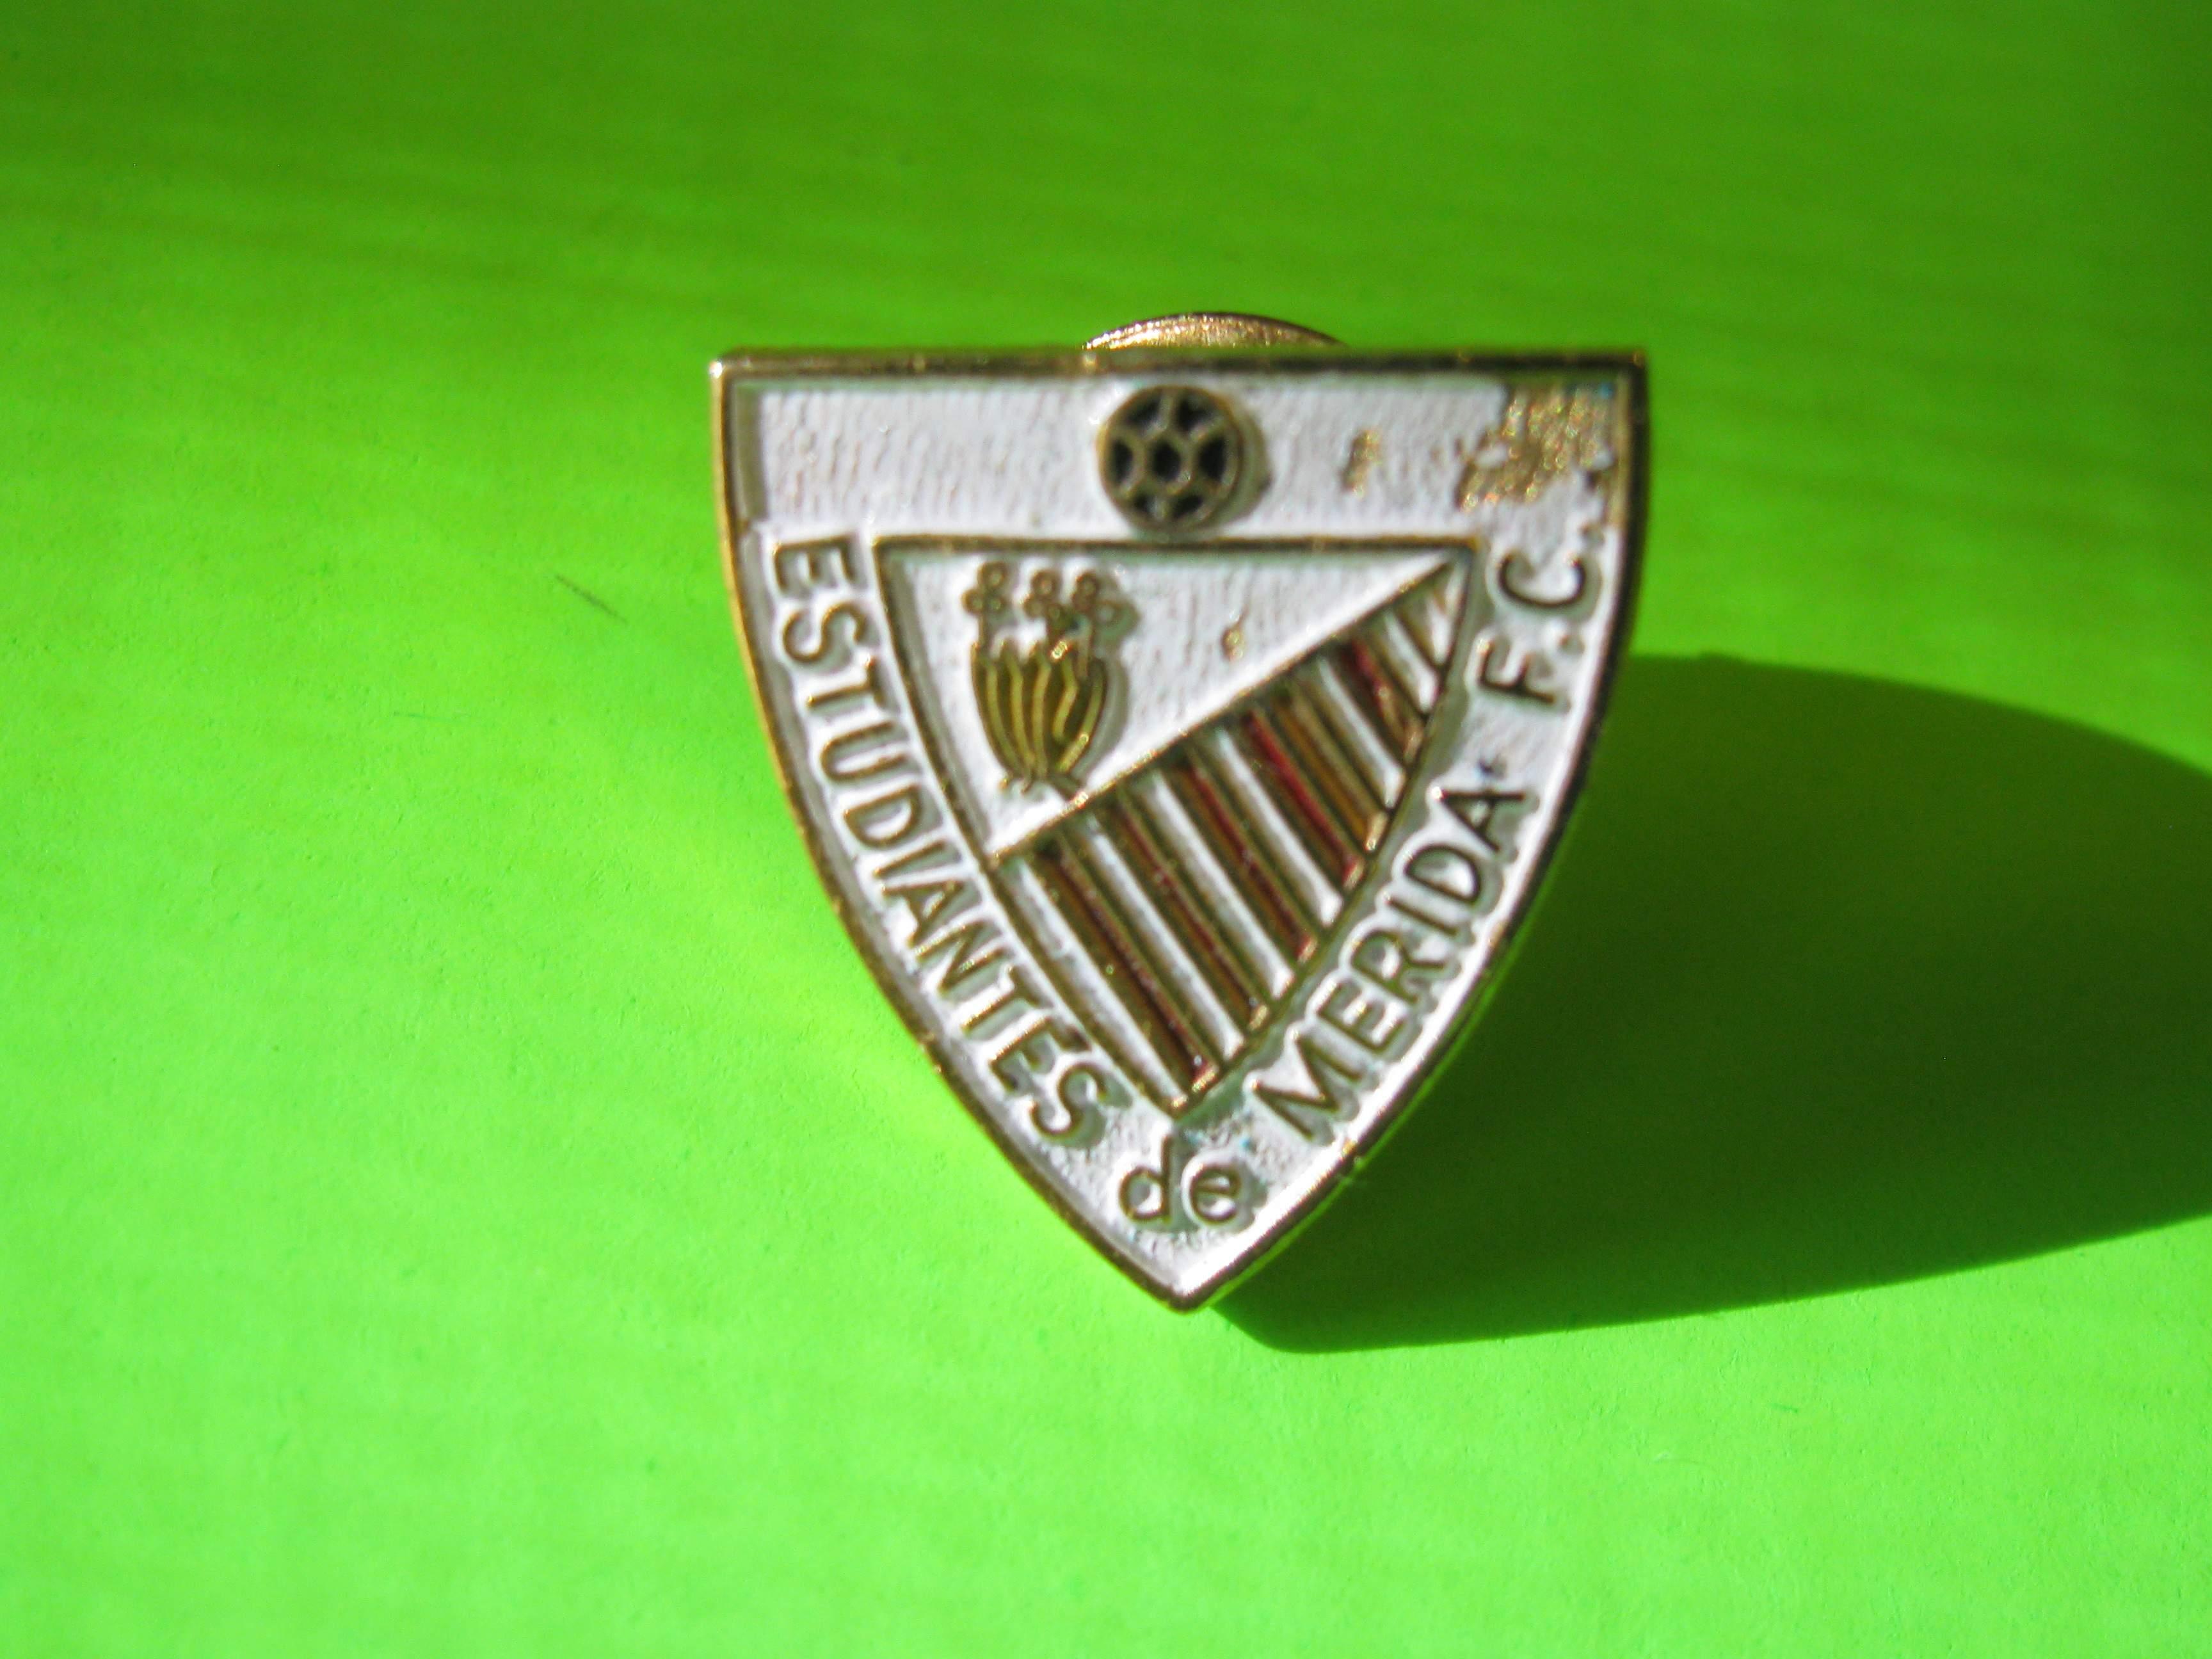 ESTUDIANTES de MERIDA F.C. Venezuela Soccer Shield Pin with Butterfly Clutch